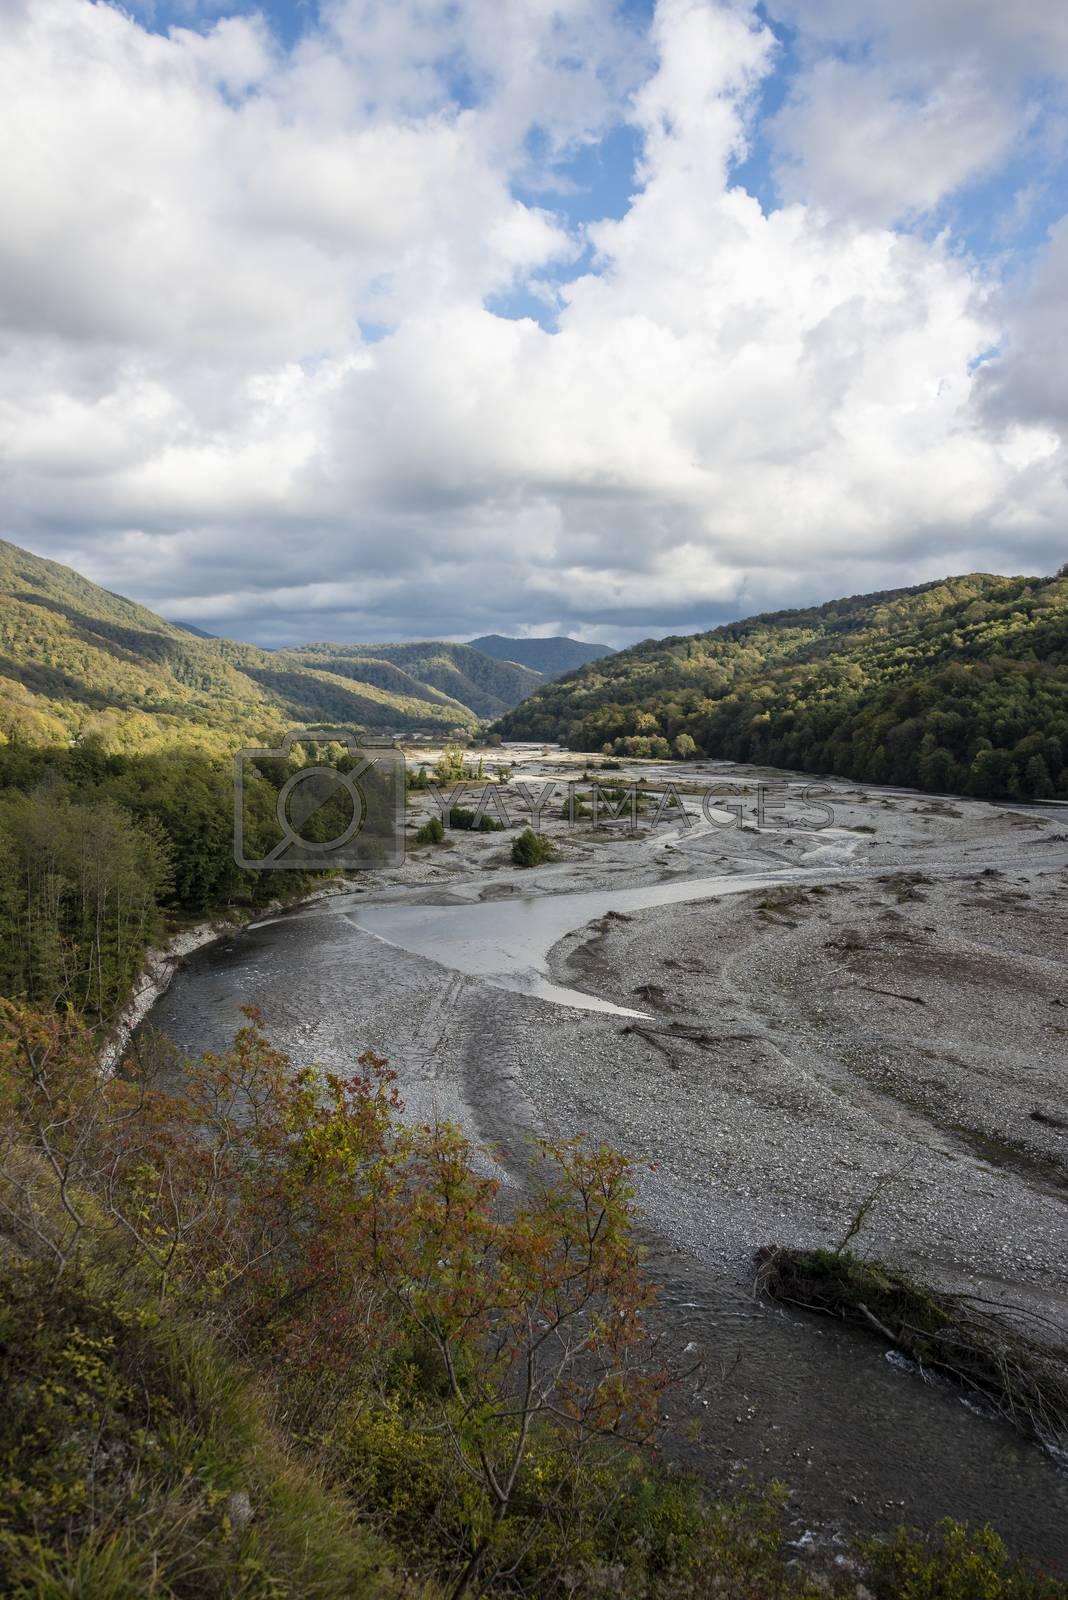 Shahe river and Caucasus mountains near Sochi, Russia. 2 November 2019.